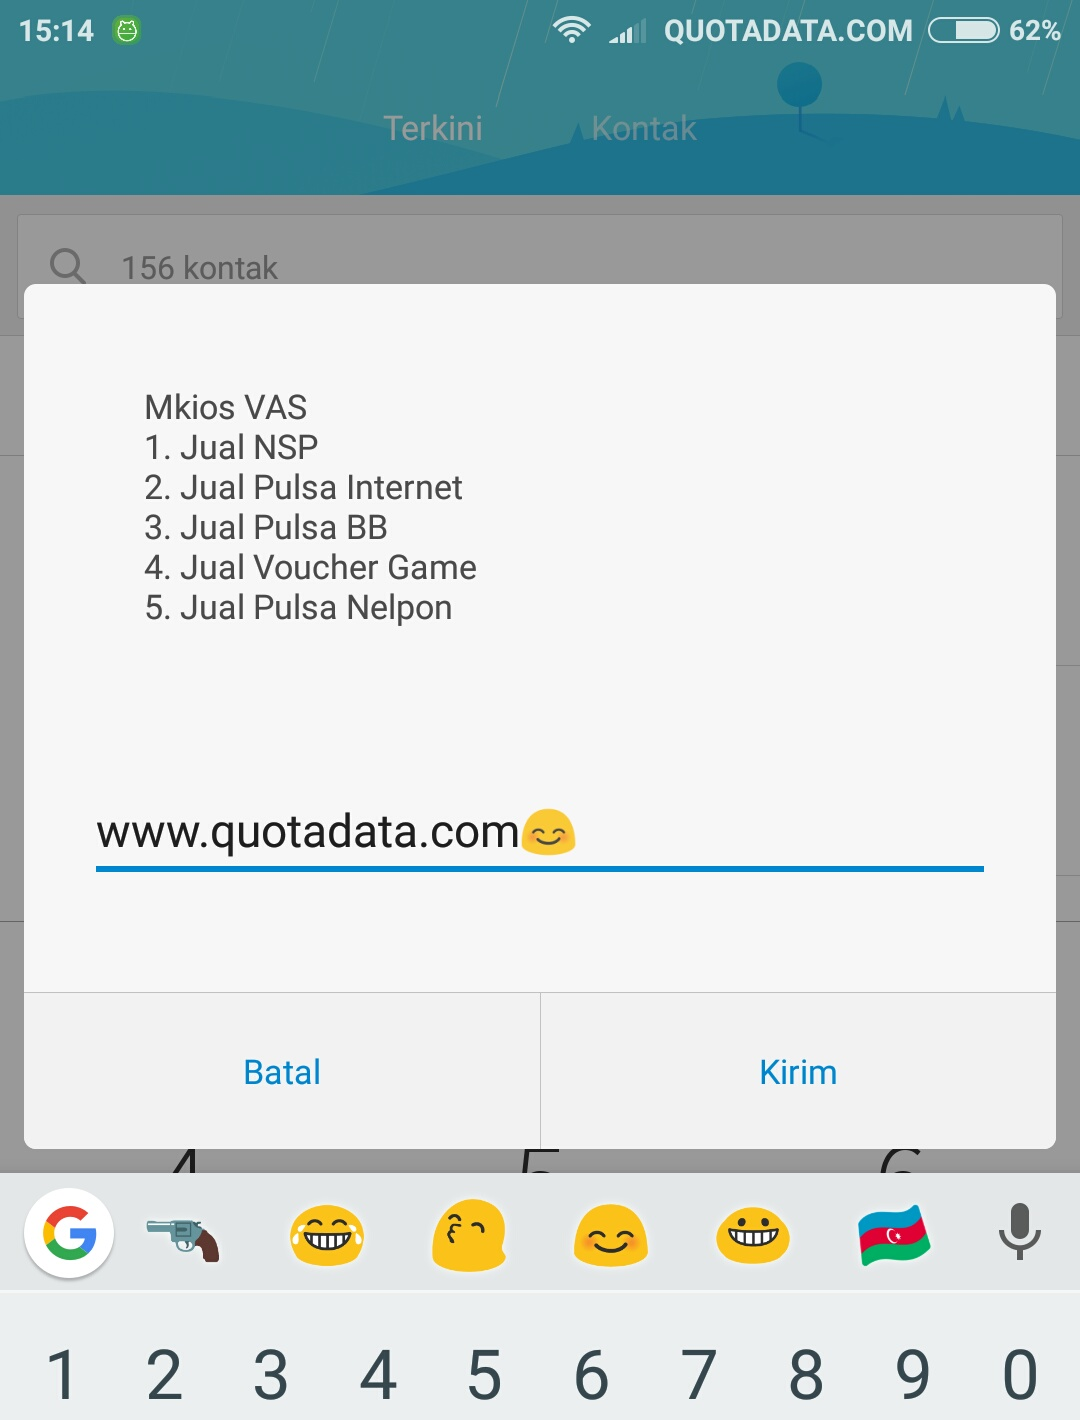 Cara Buat Kartu Sakti Telkomsel 2018 Terbaru Quota Data Perdana Tsel Kuota 9gb Mendapatkan